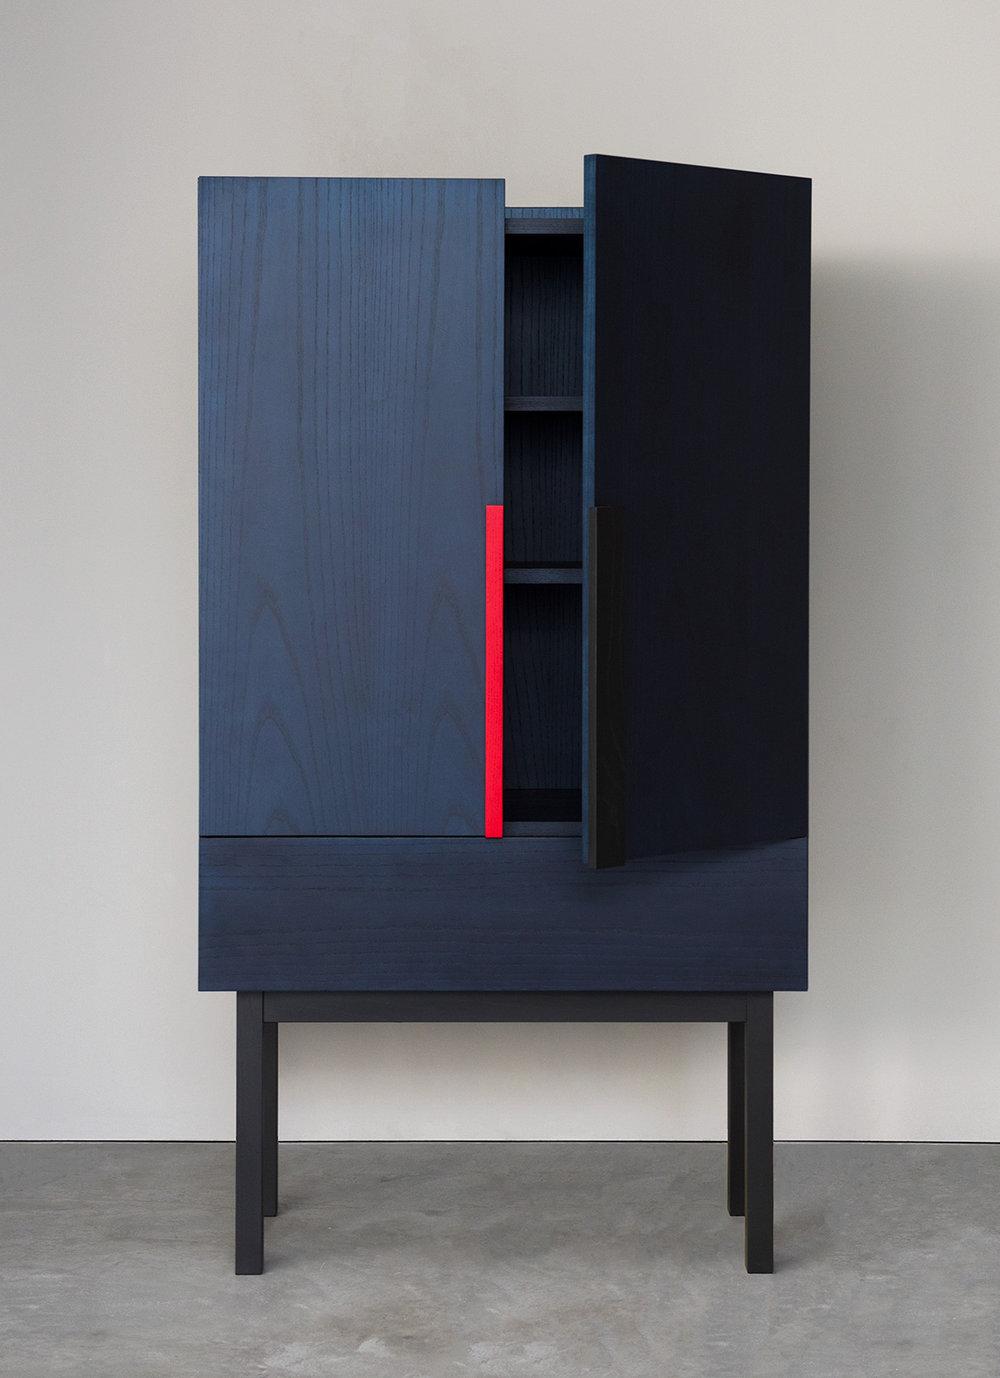 Zoe-Mowat-Aizome-Cabinet-for-Ariake 2.jpeg